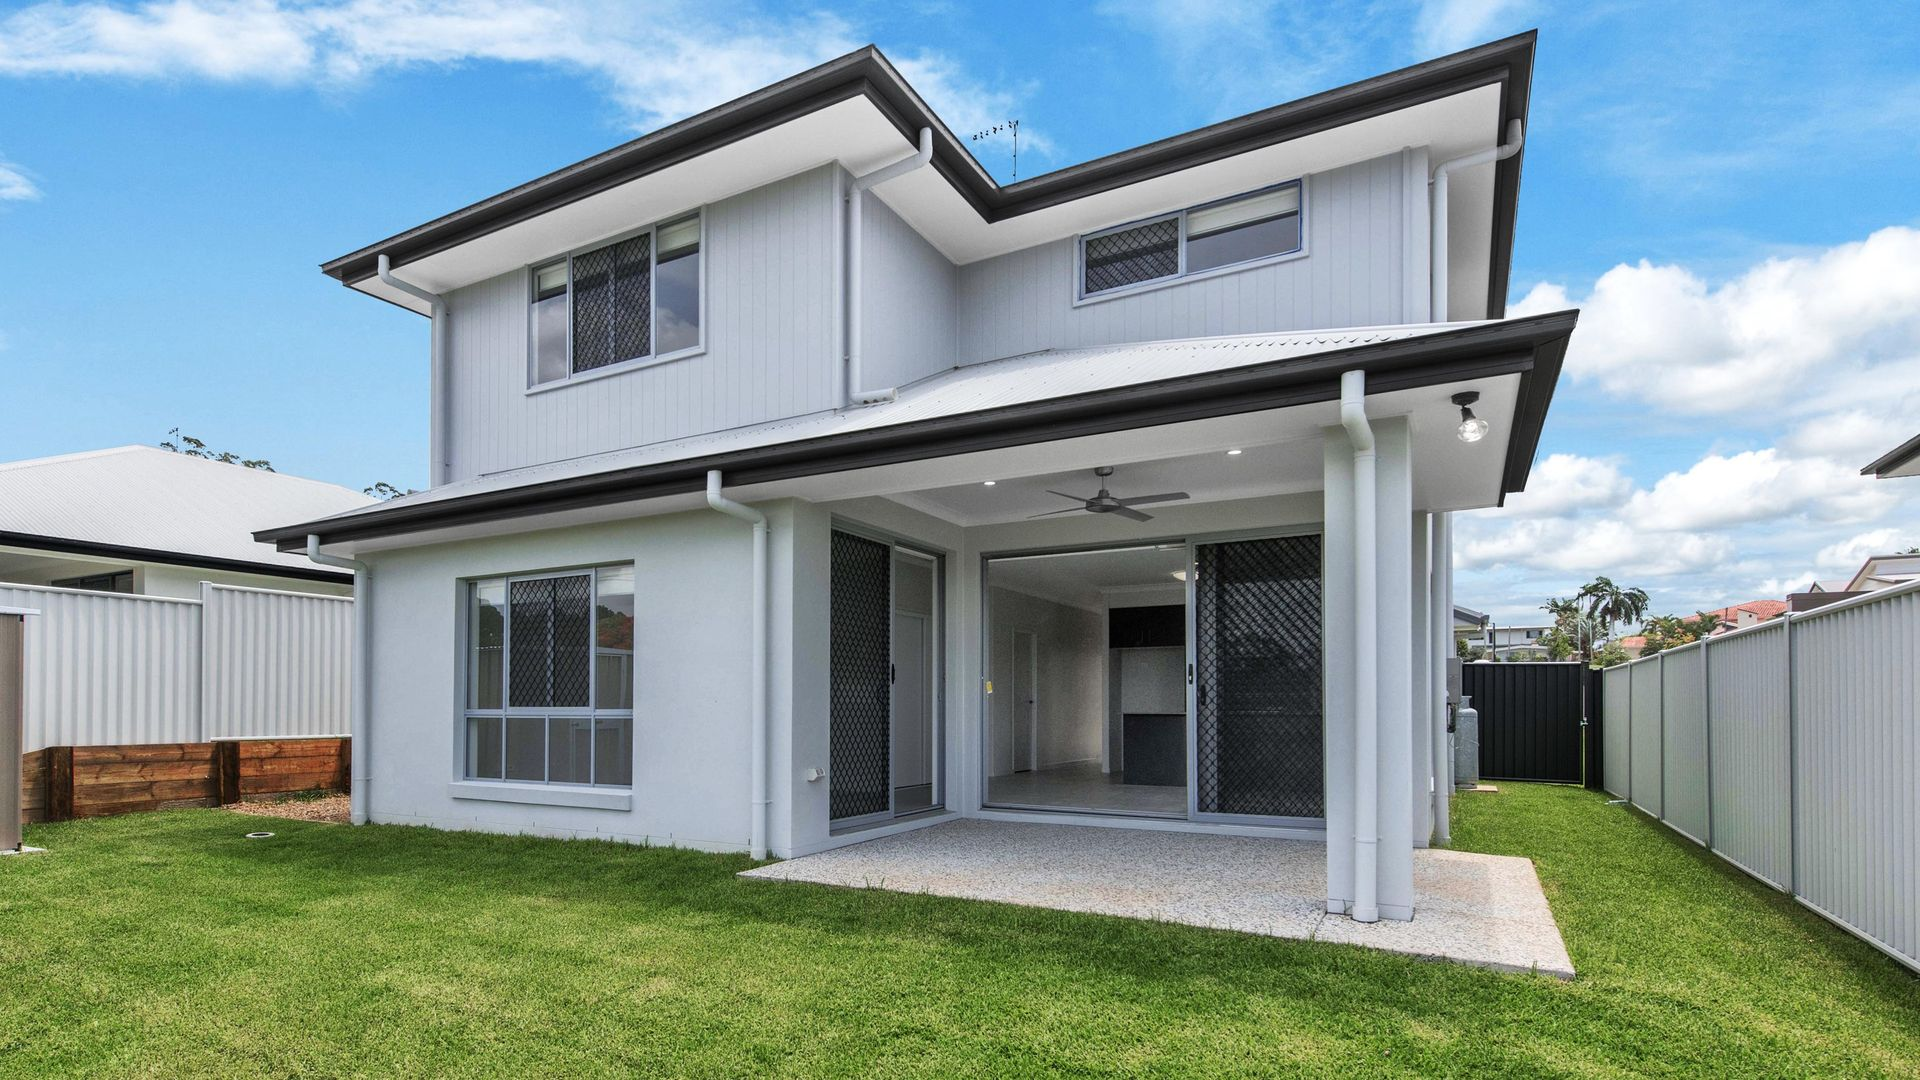 16 Aldritt Place, Bridgeman Downs QLD 4035, Image 1